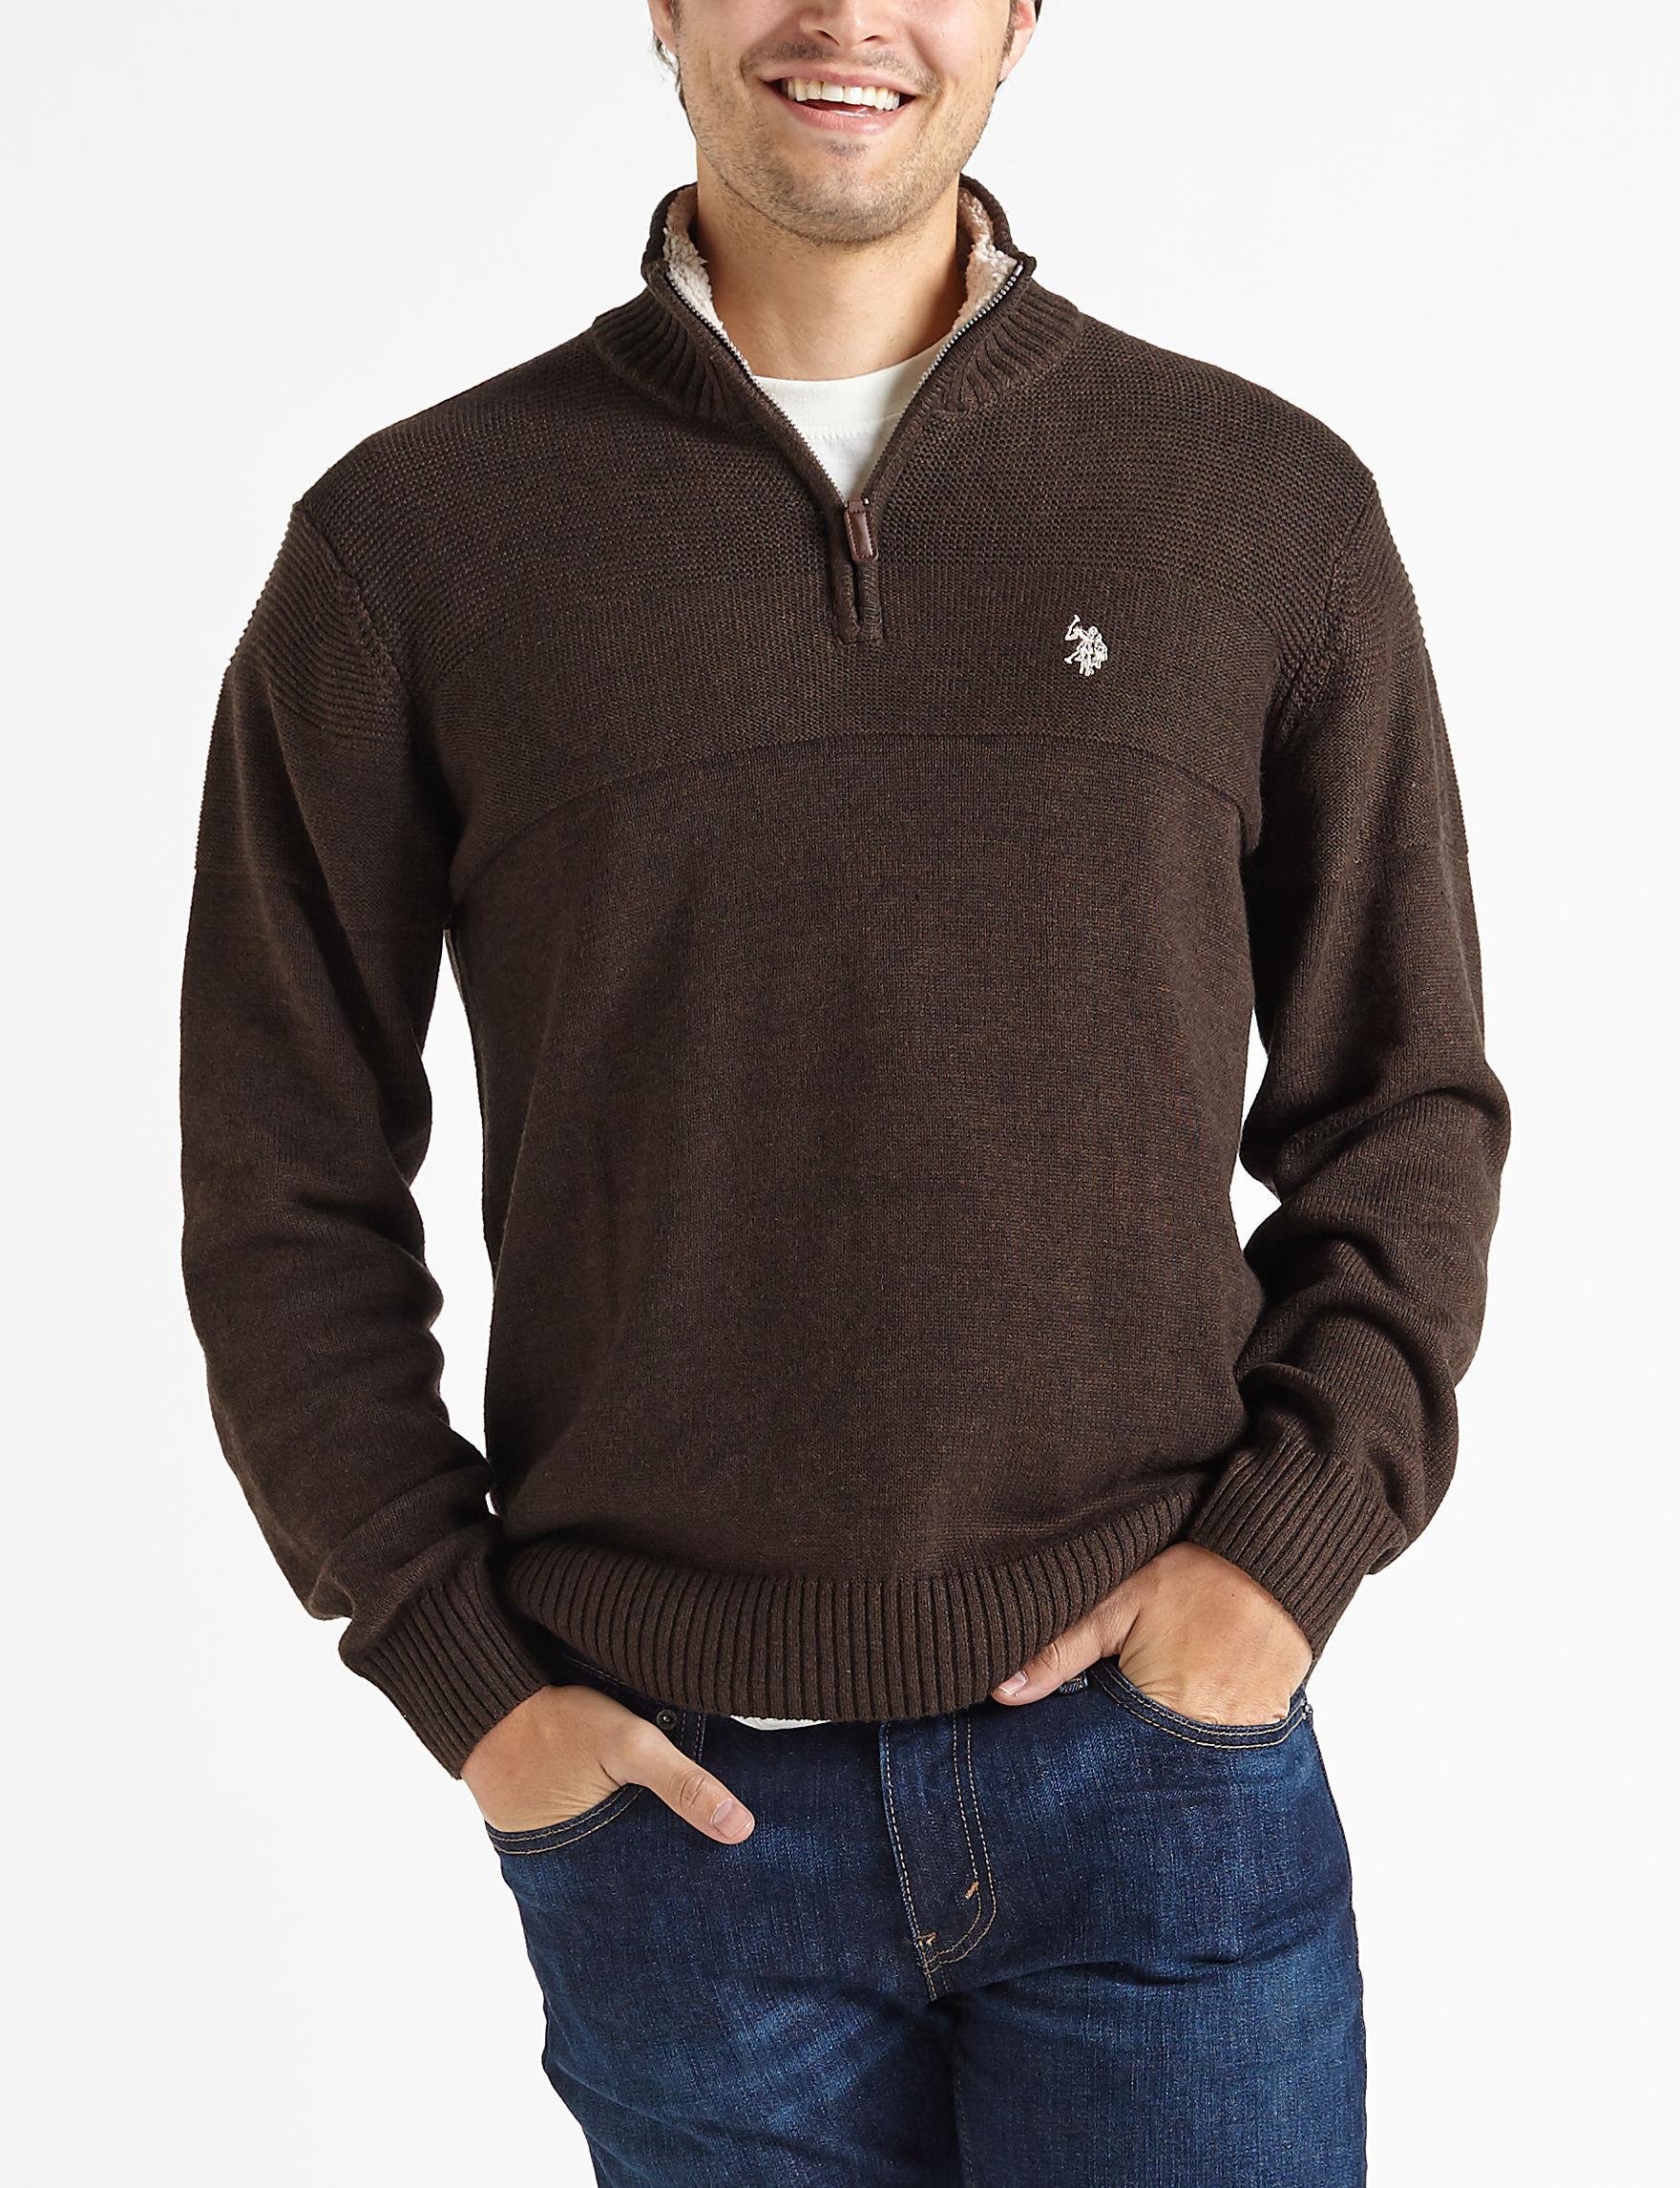 U.S. Polo Assn. Dark Brown